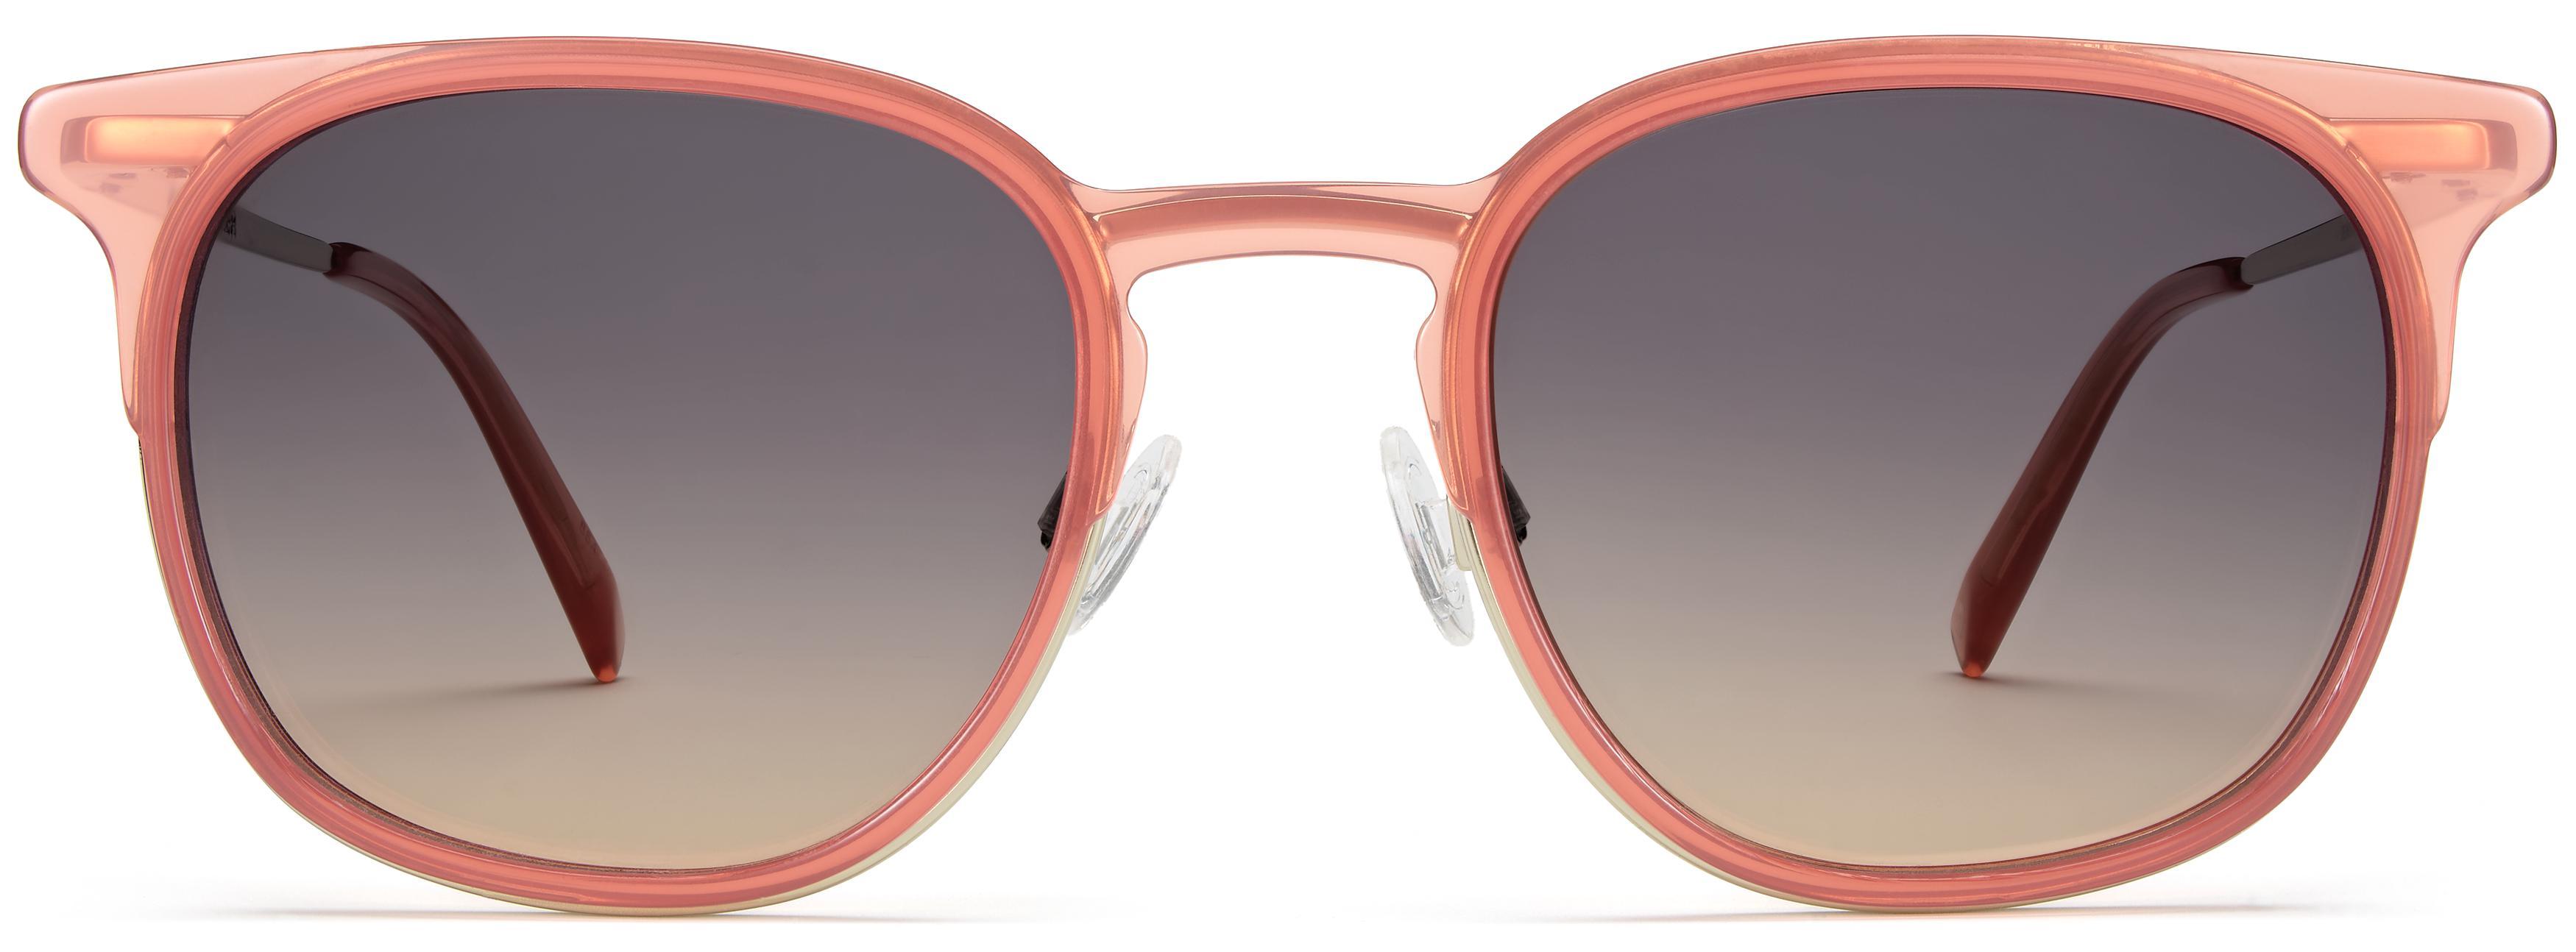 f10a32d3b34b Women's Sunglasses | Warby Parker